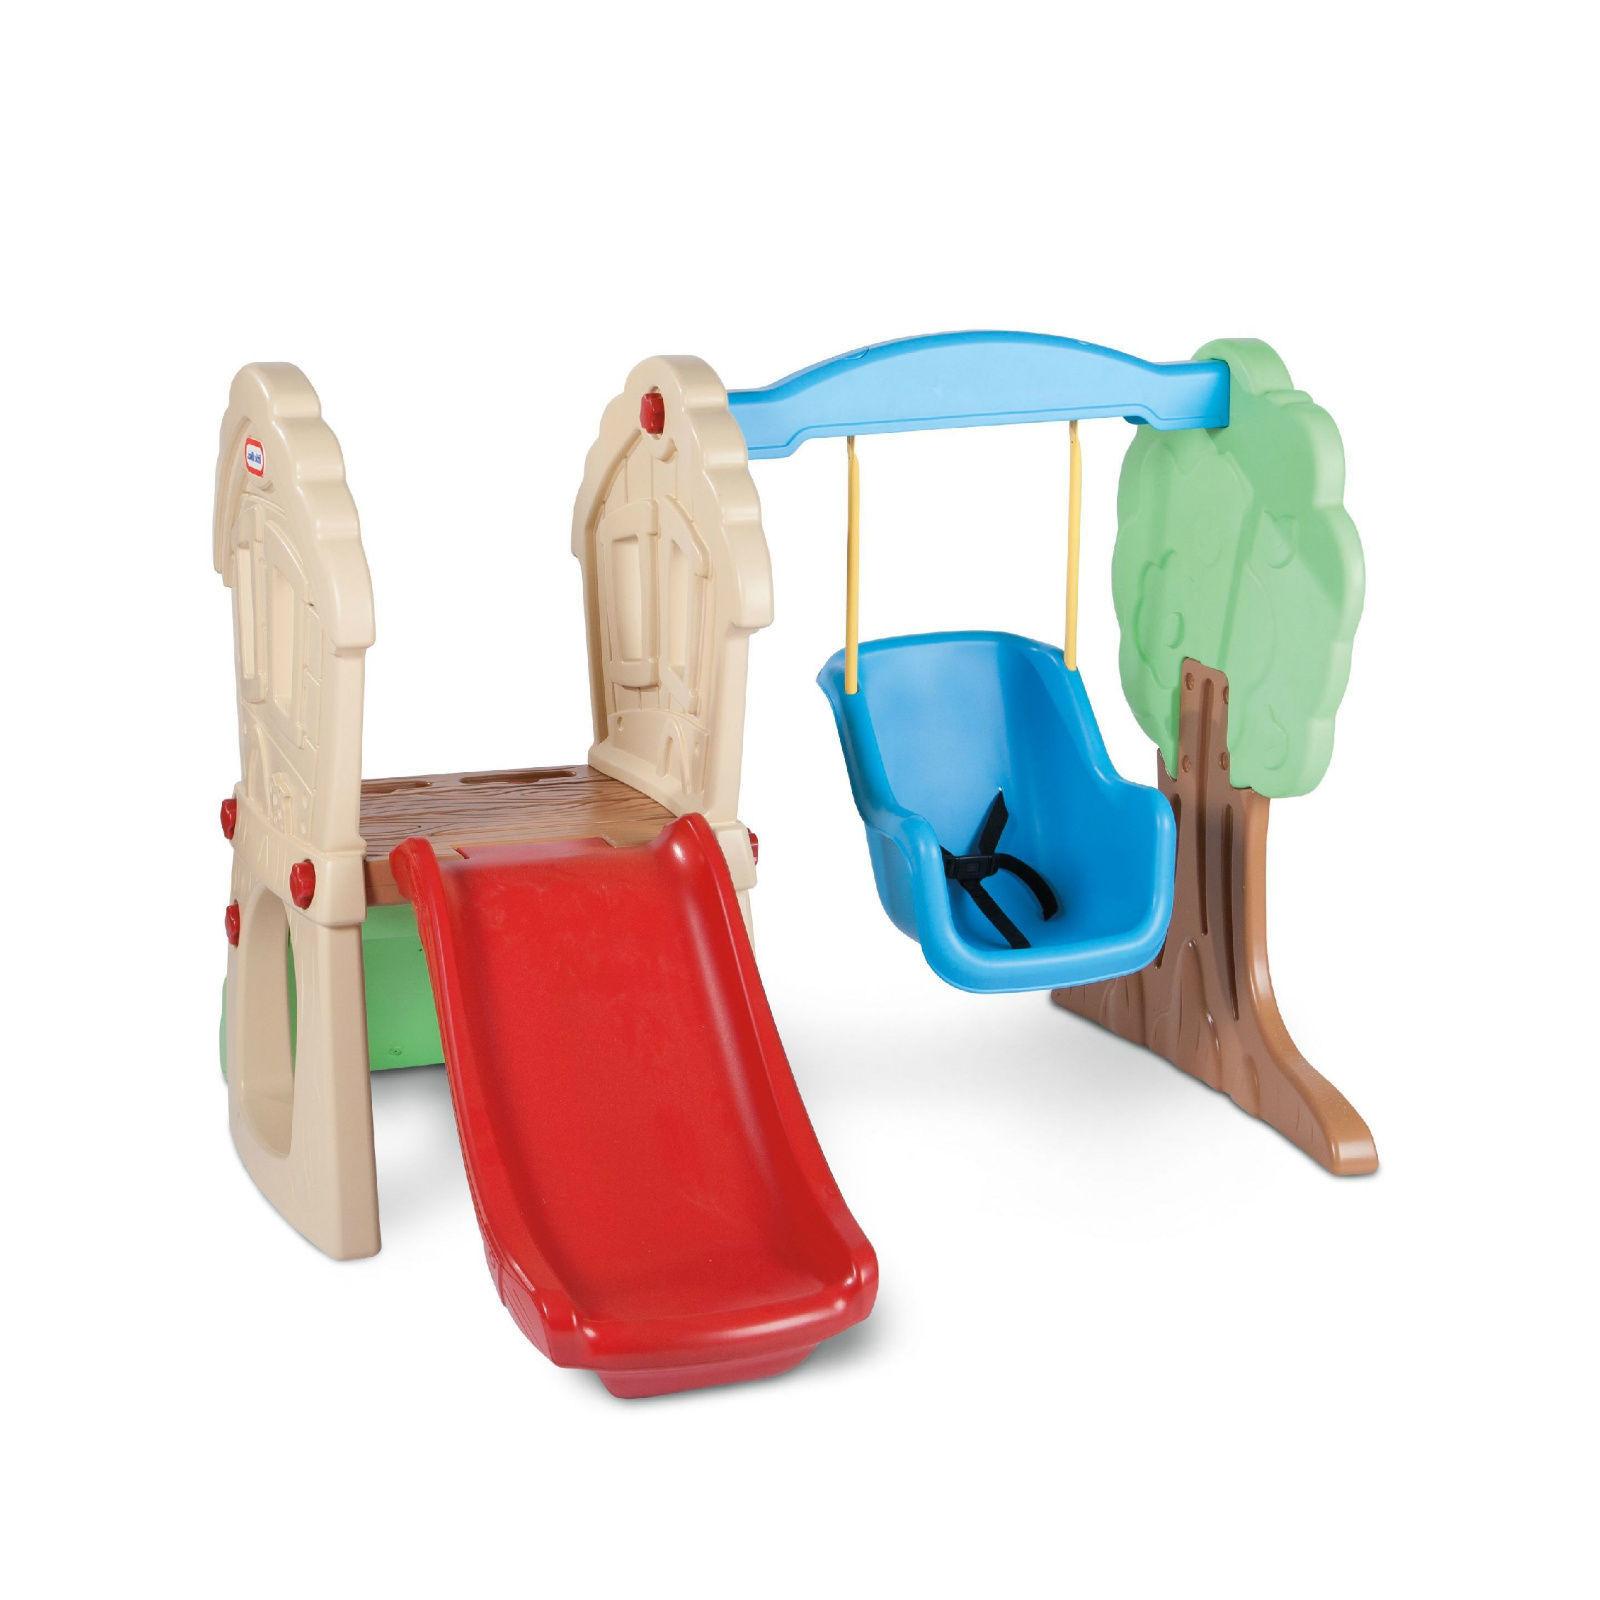 Little Tikes Orange Slides : Swing sets for children outdoor little tikes toddlers